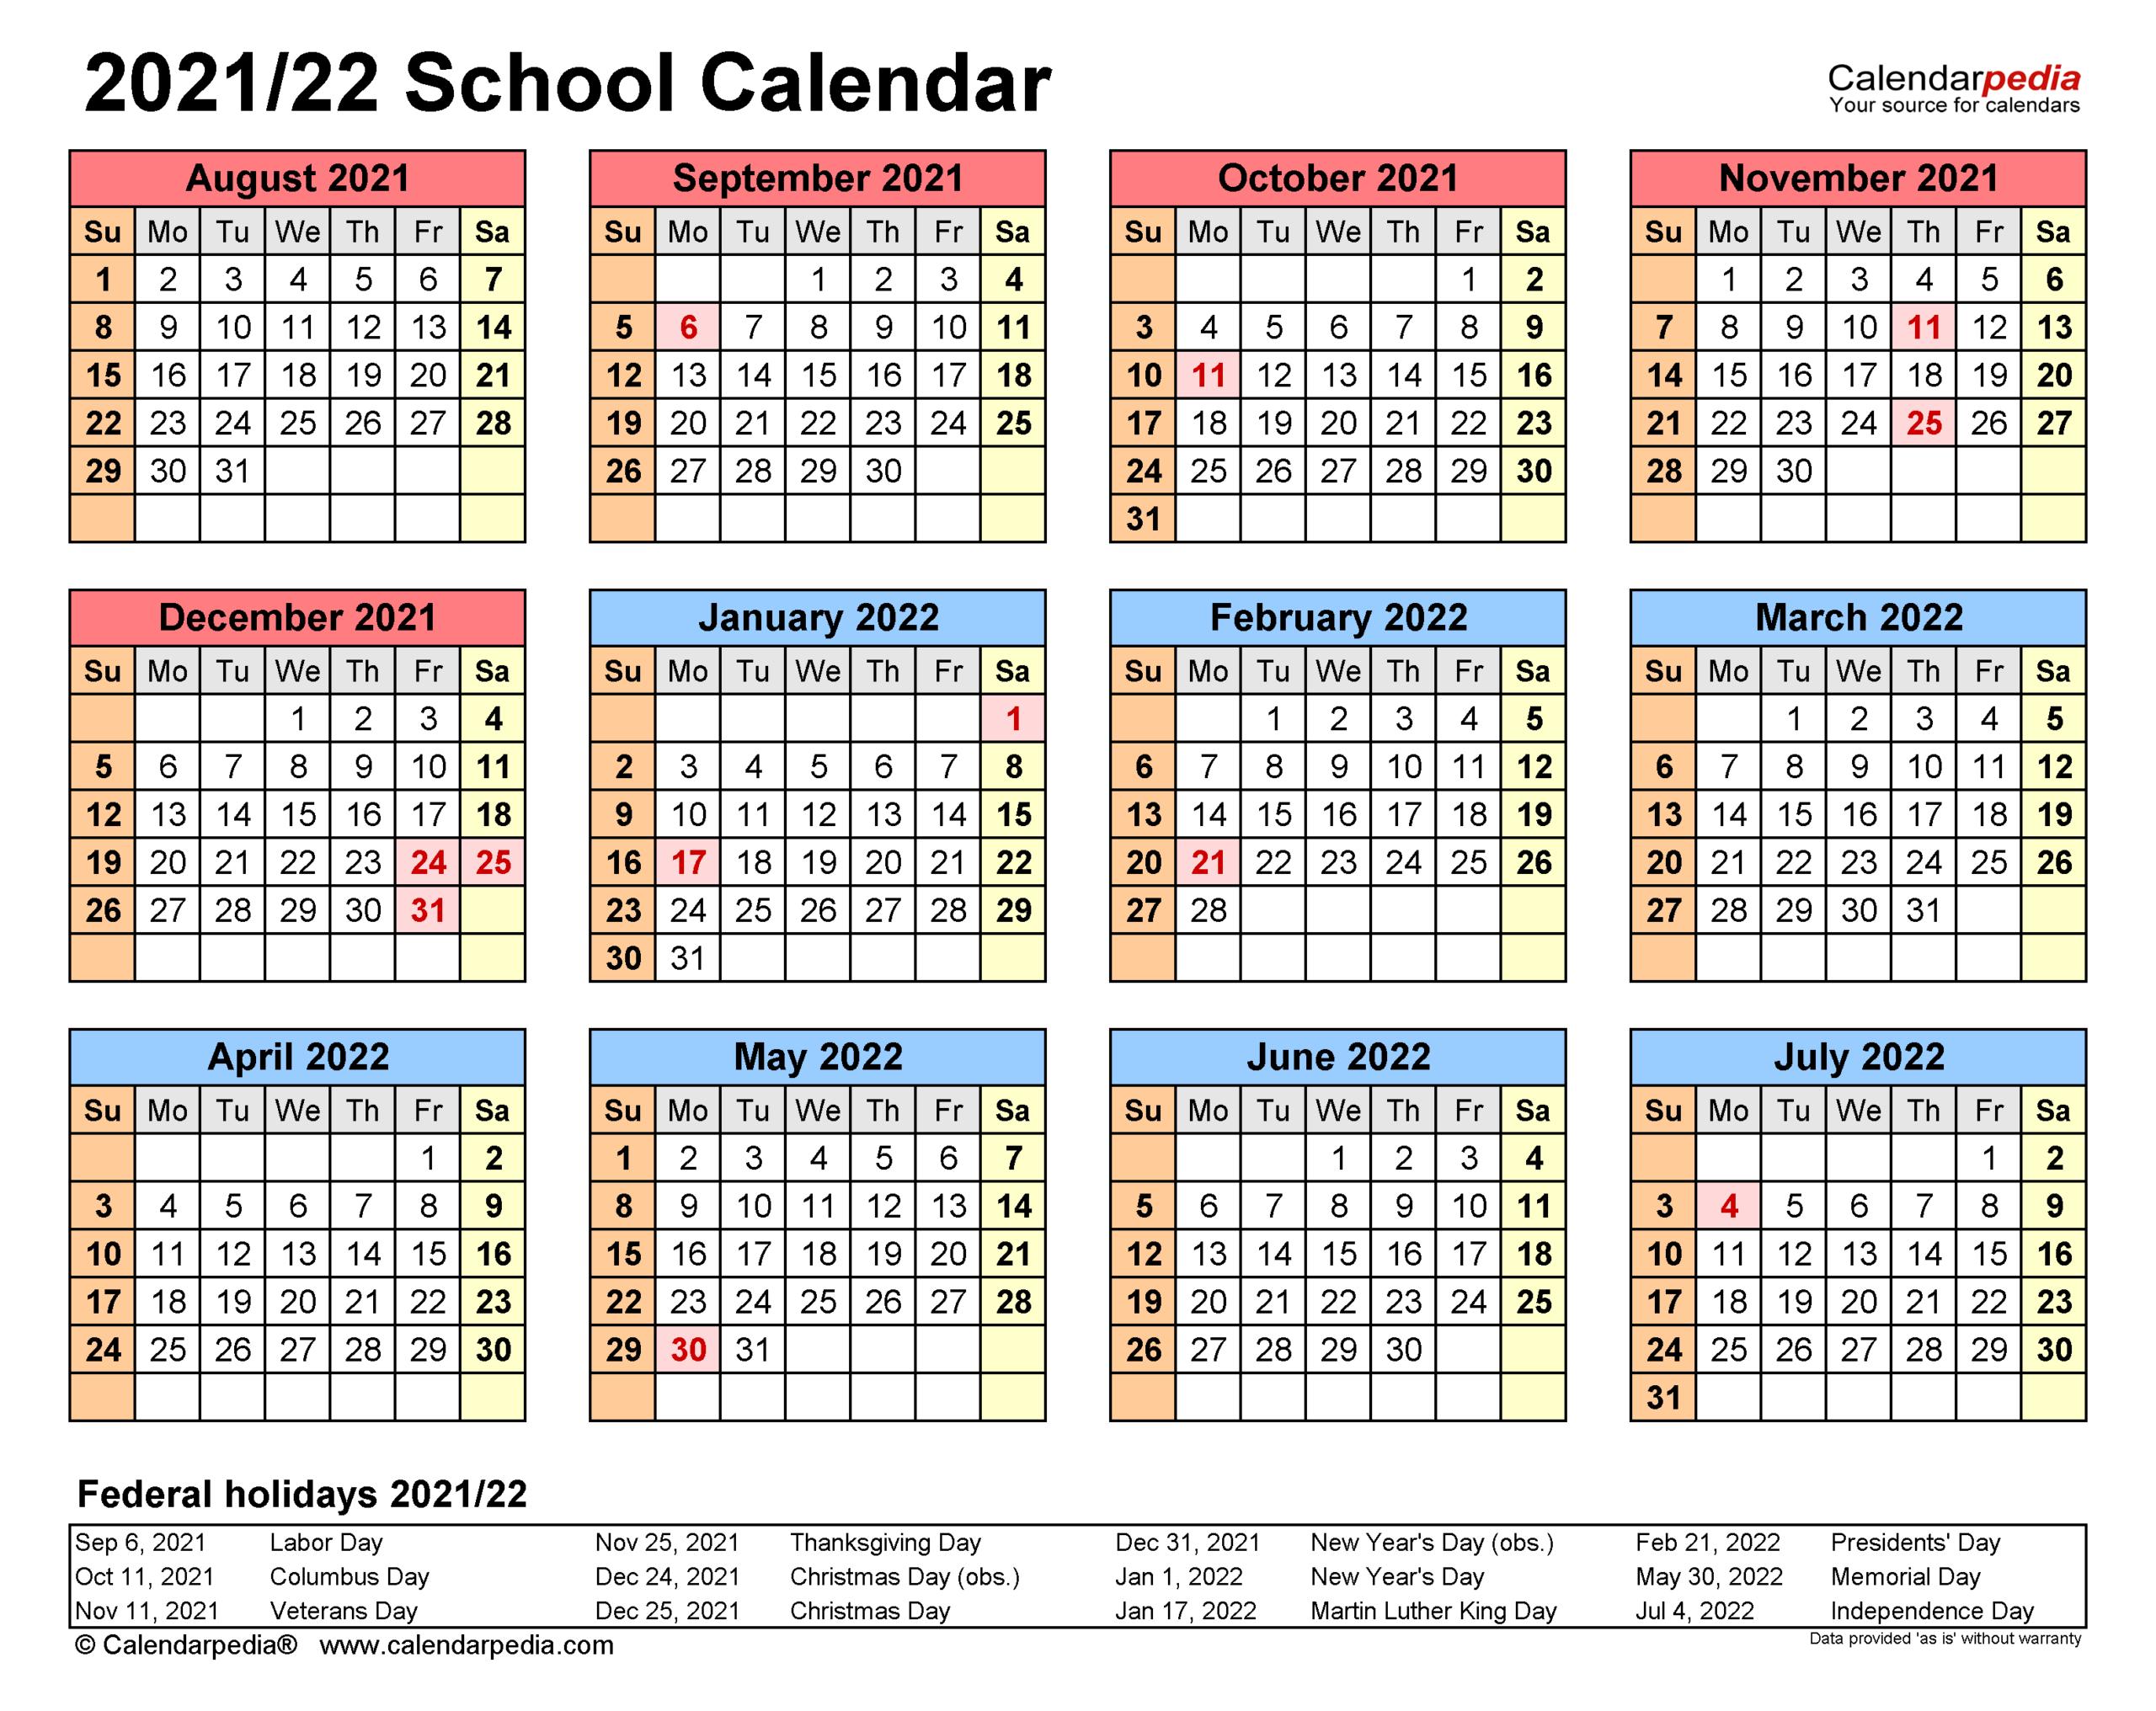 Cvesd Calendar 2021 2022   Printable March for 2022- 2022 Bakersfield City School Districtcalendar